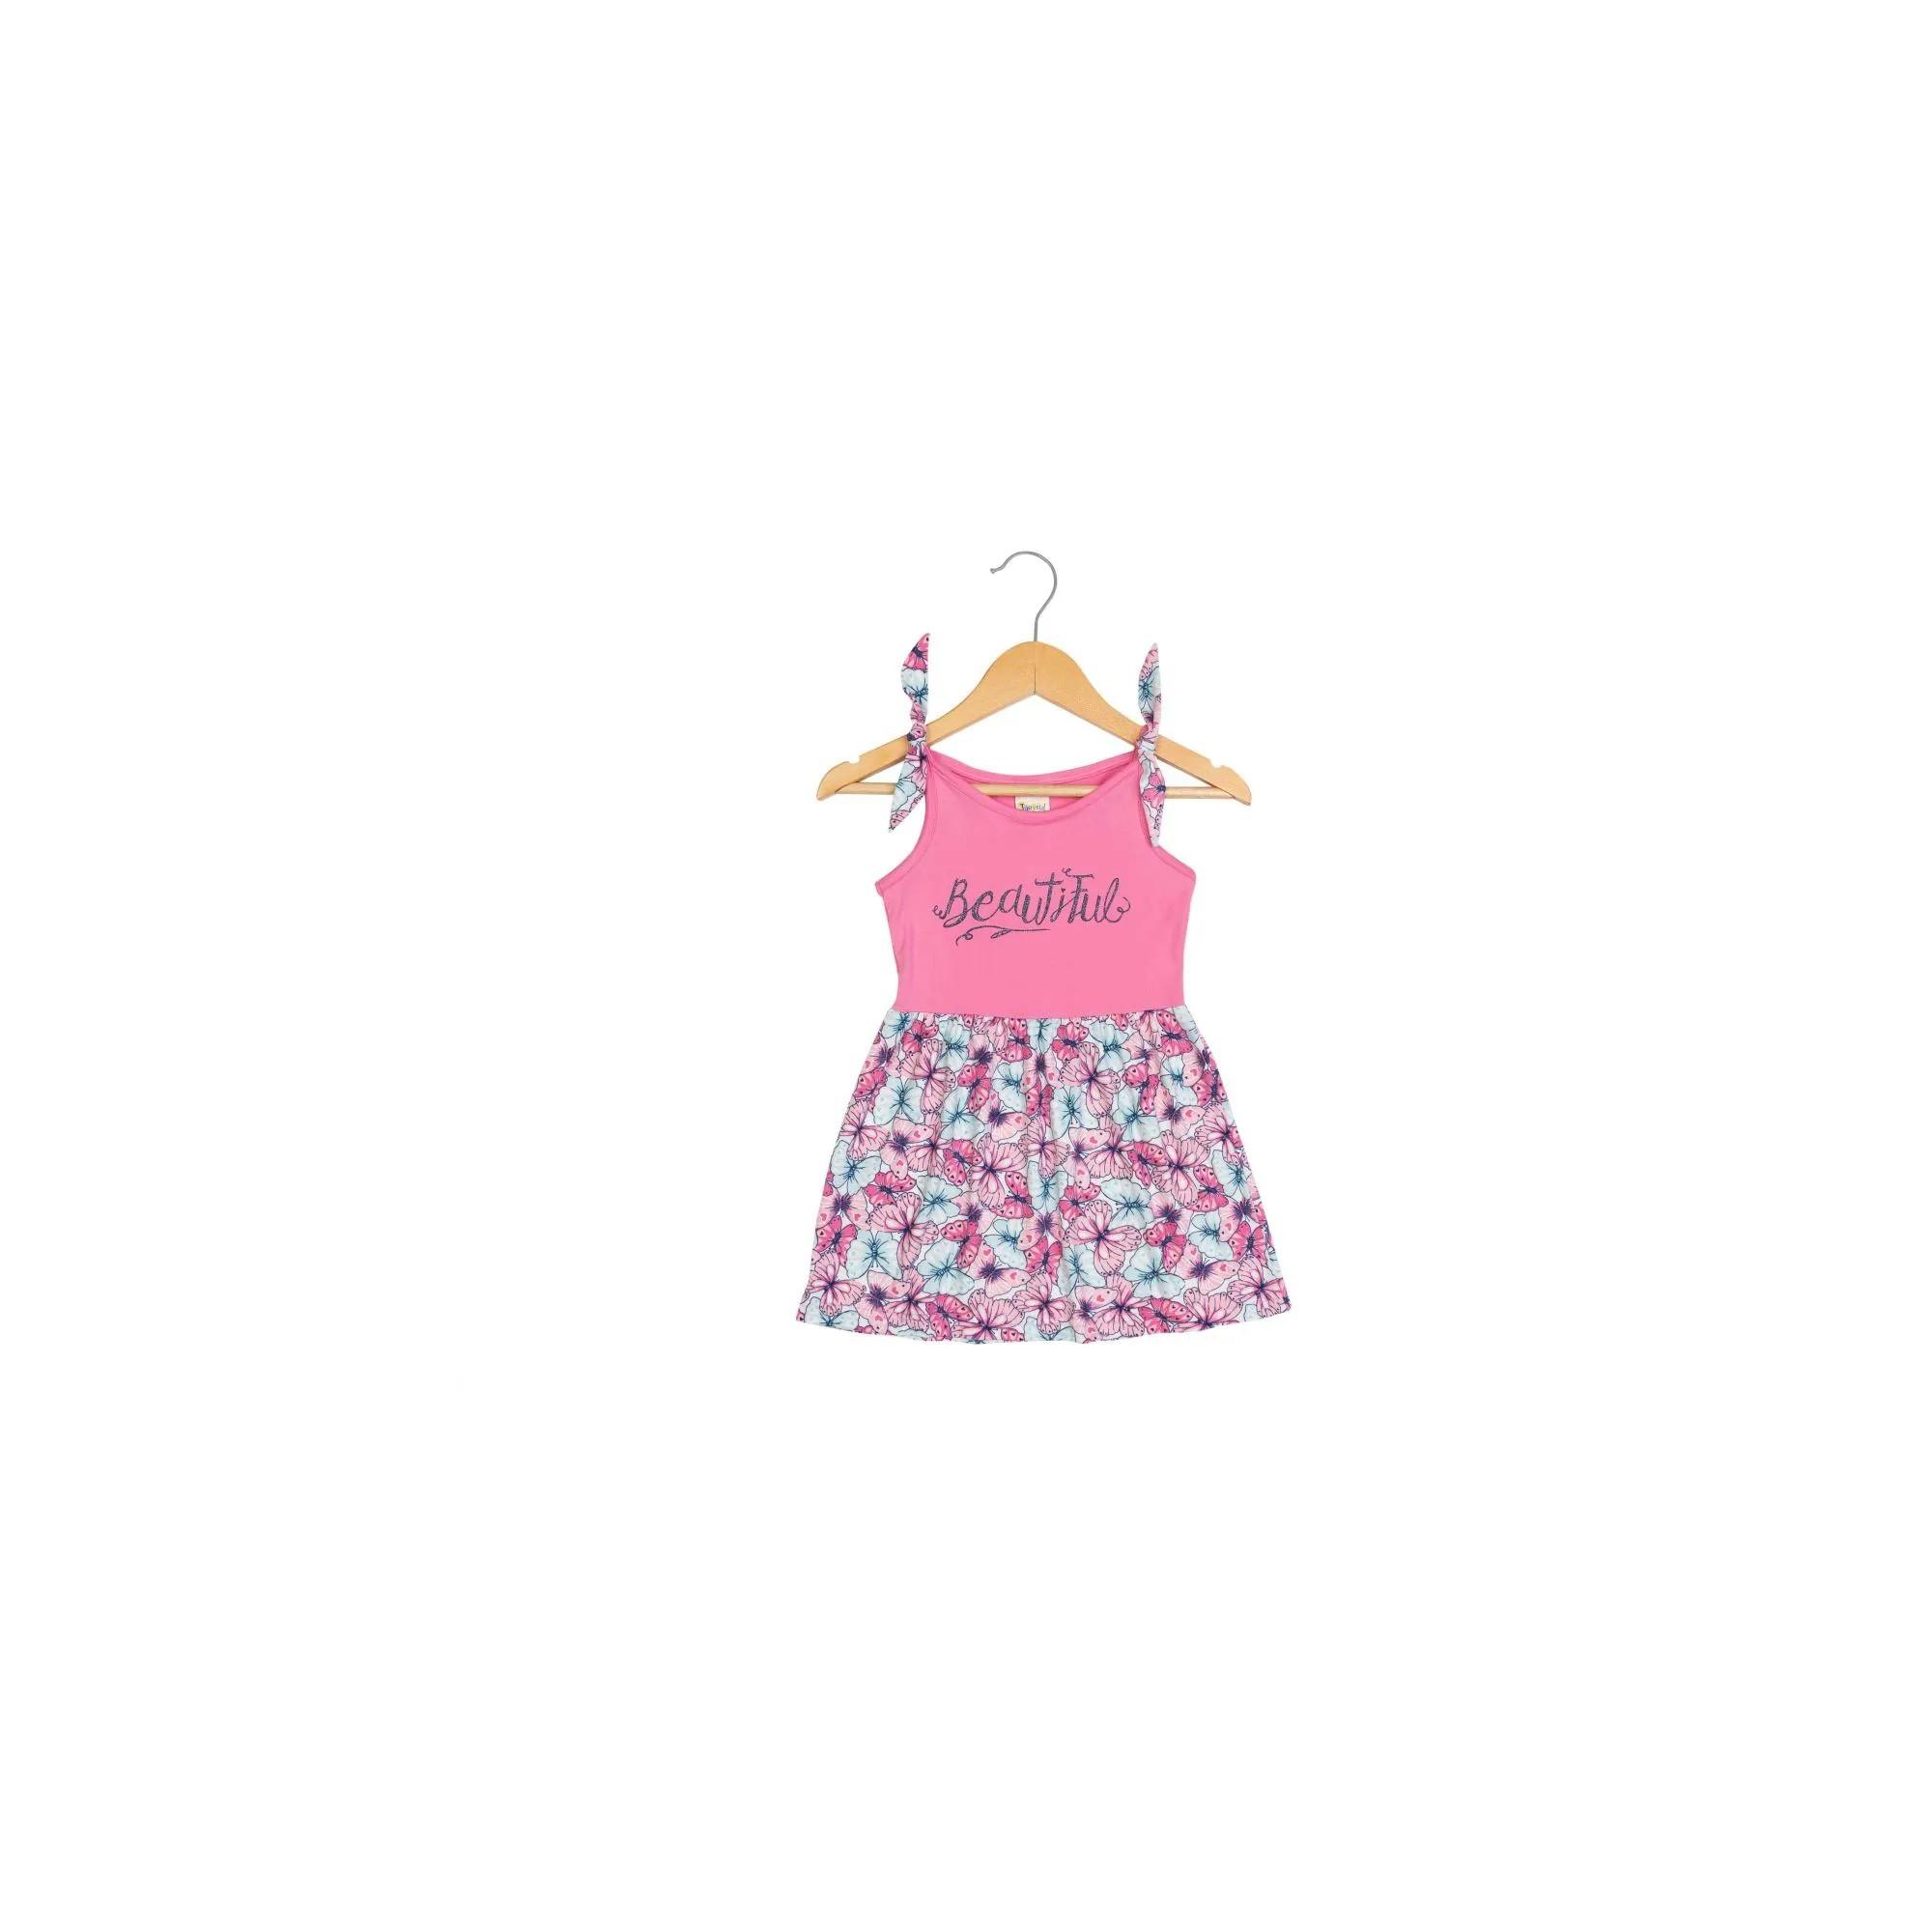 Vestido Feminino Tileesul 11546